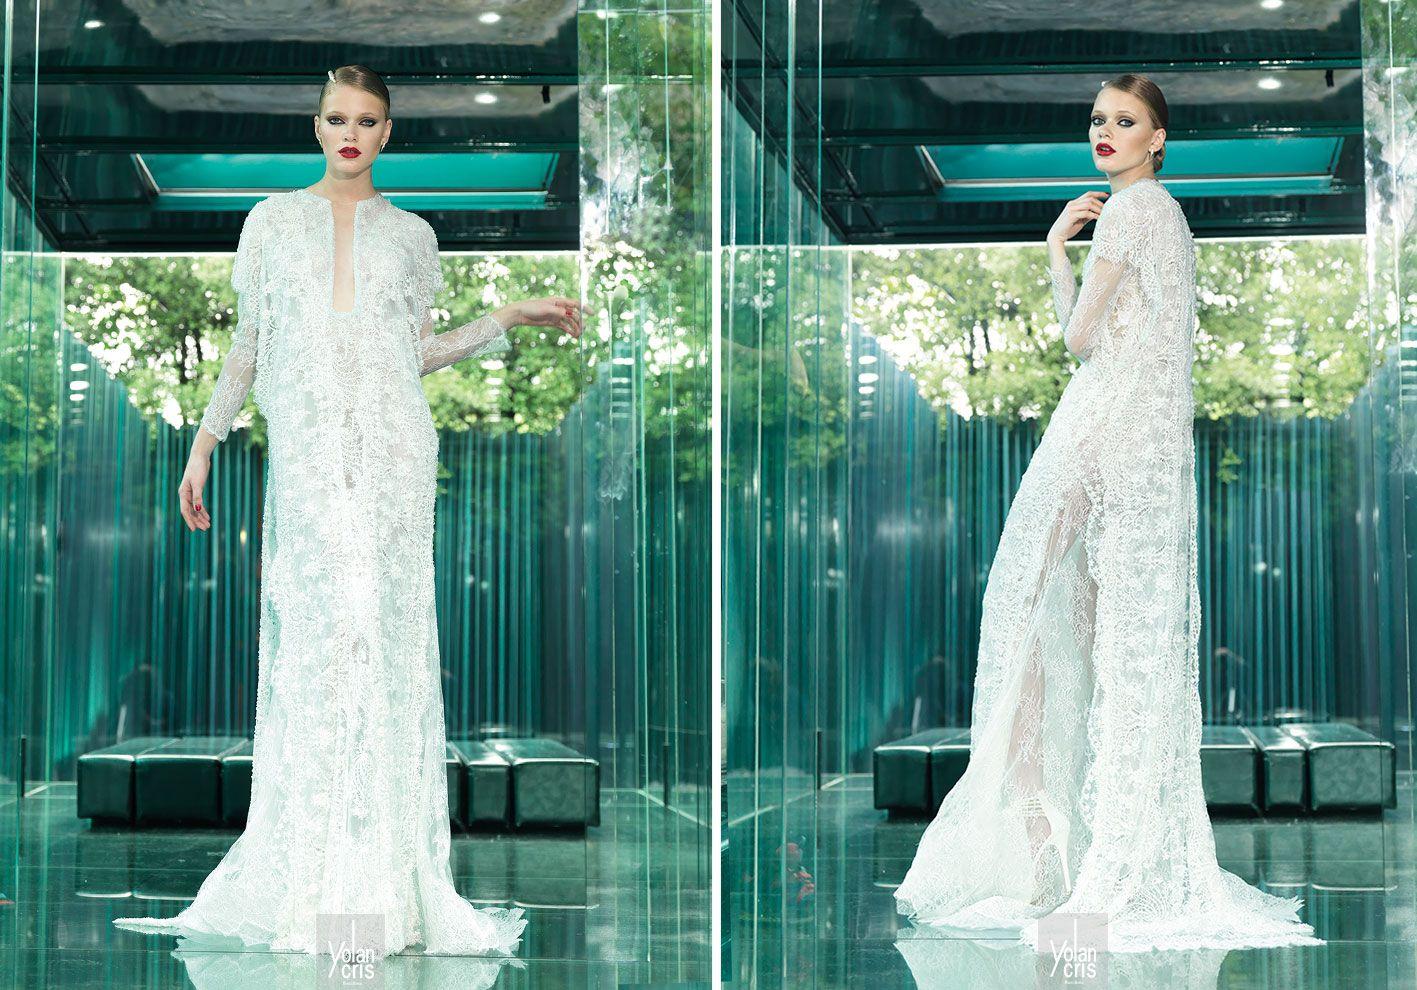 Amazing Vestidos De Novia Yolancris Contemporary - Wedding Ideas ...